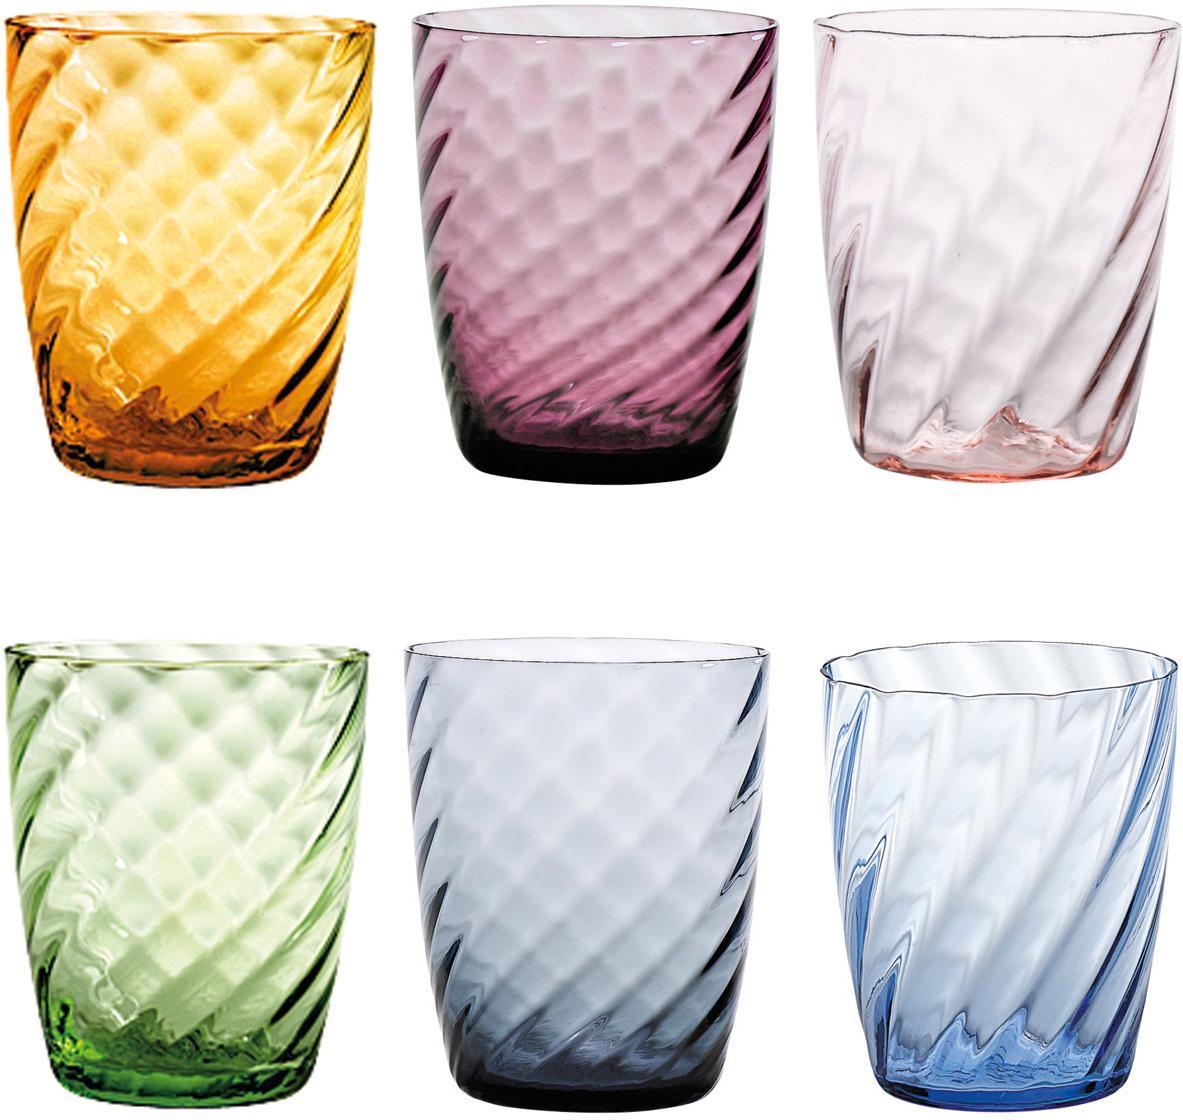 Waterglazen Torson met verschillende reliëfs in kleur, 6-delig, Glas, Multicolour, Ø 8 x H 10 cm